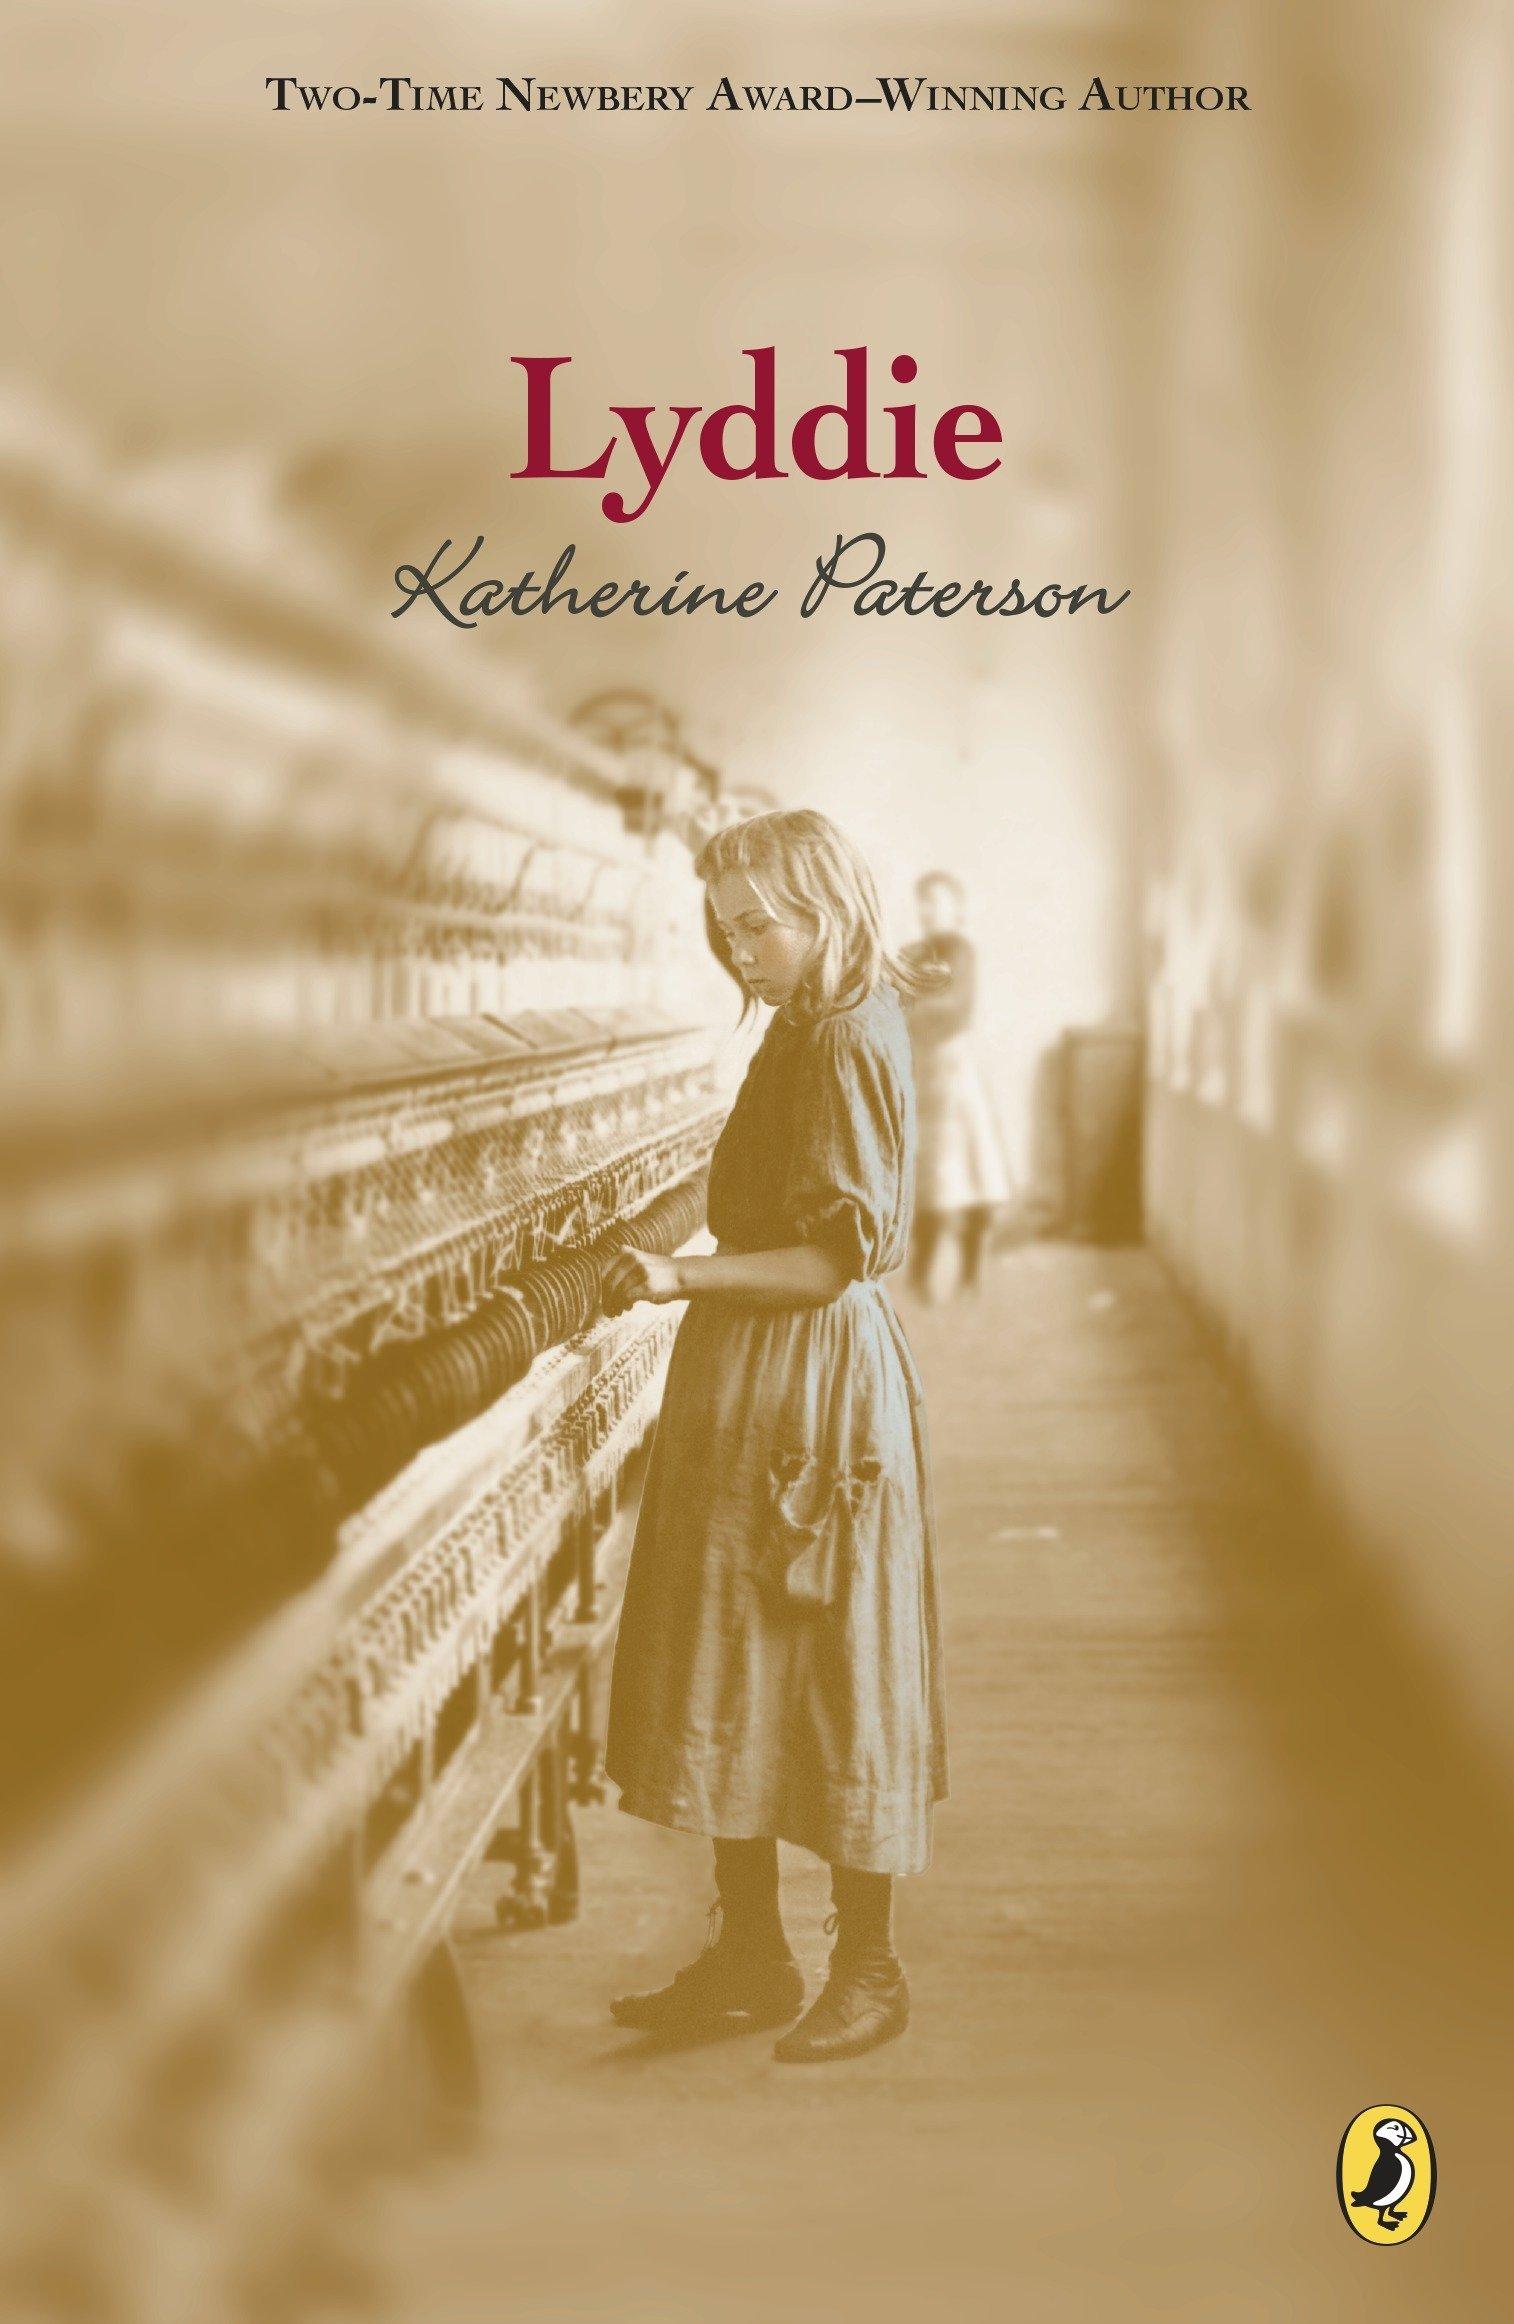 Image result for lyddie